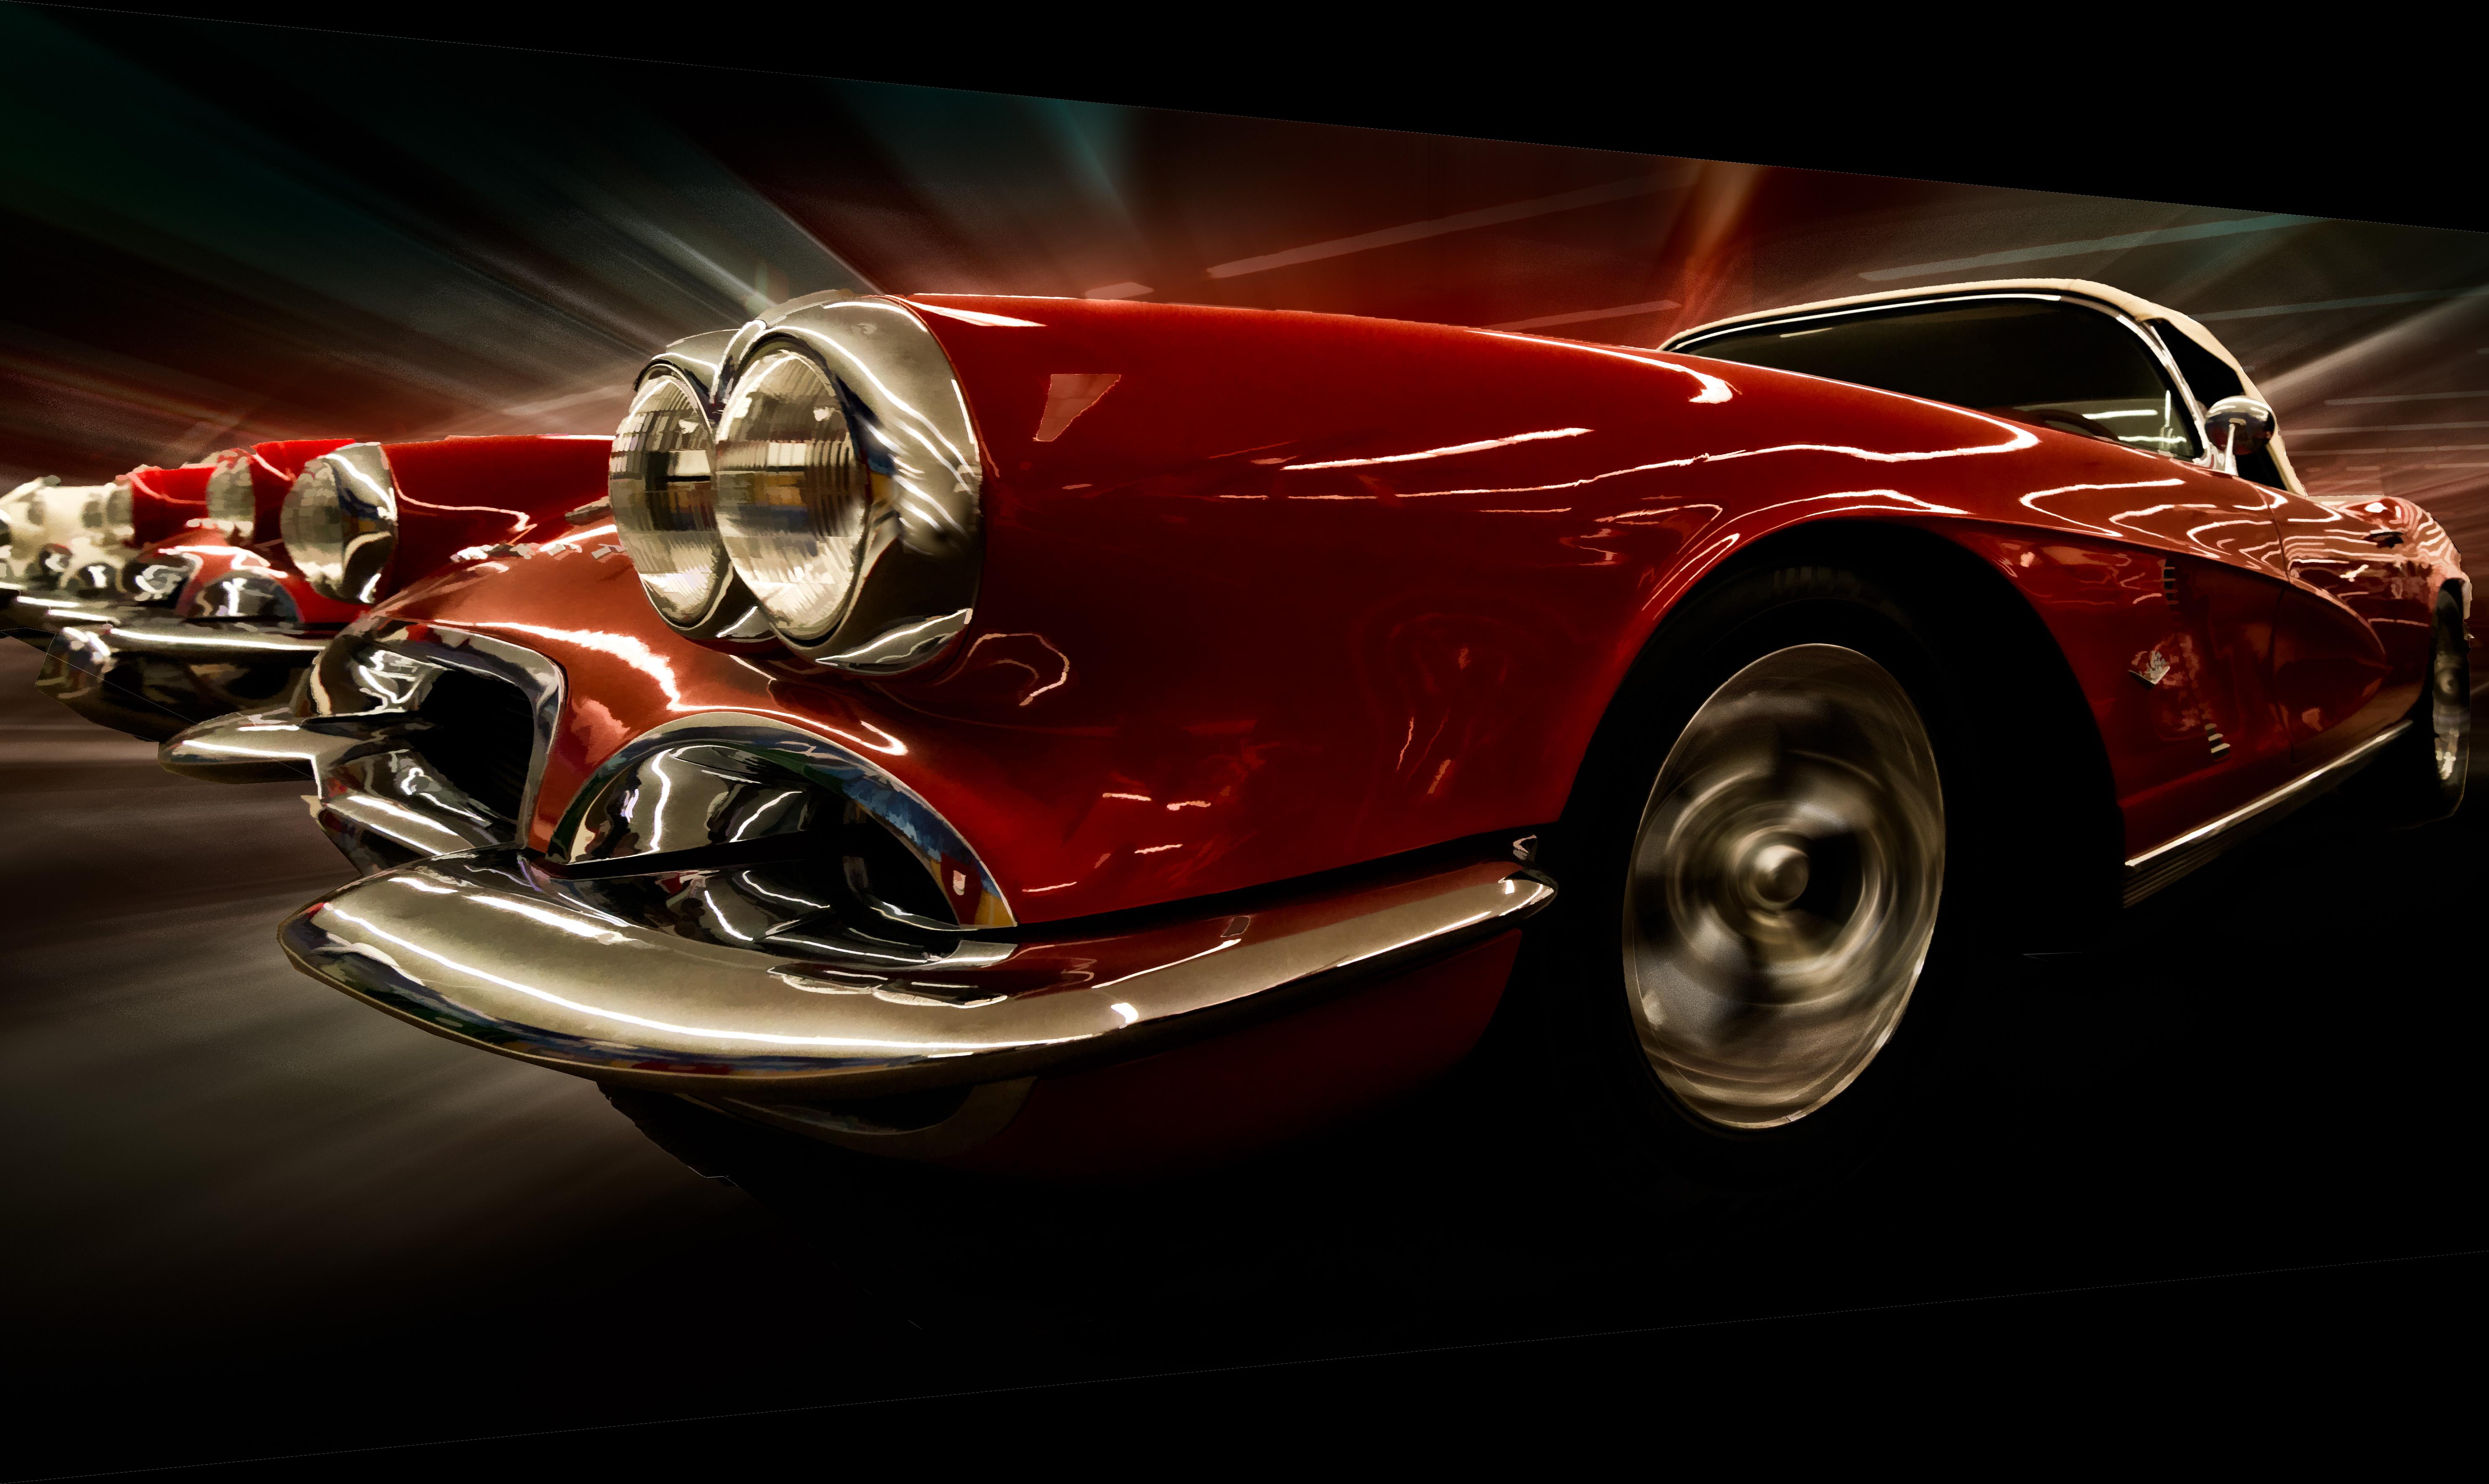 Sport Wallpaper Vintage: Wallpaper : Red, Sports Car, Vintage Car, Classic Car